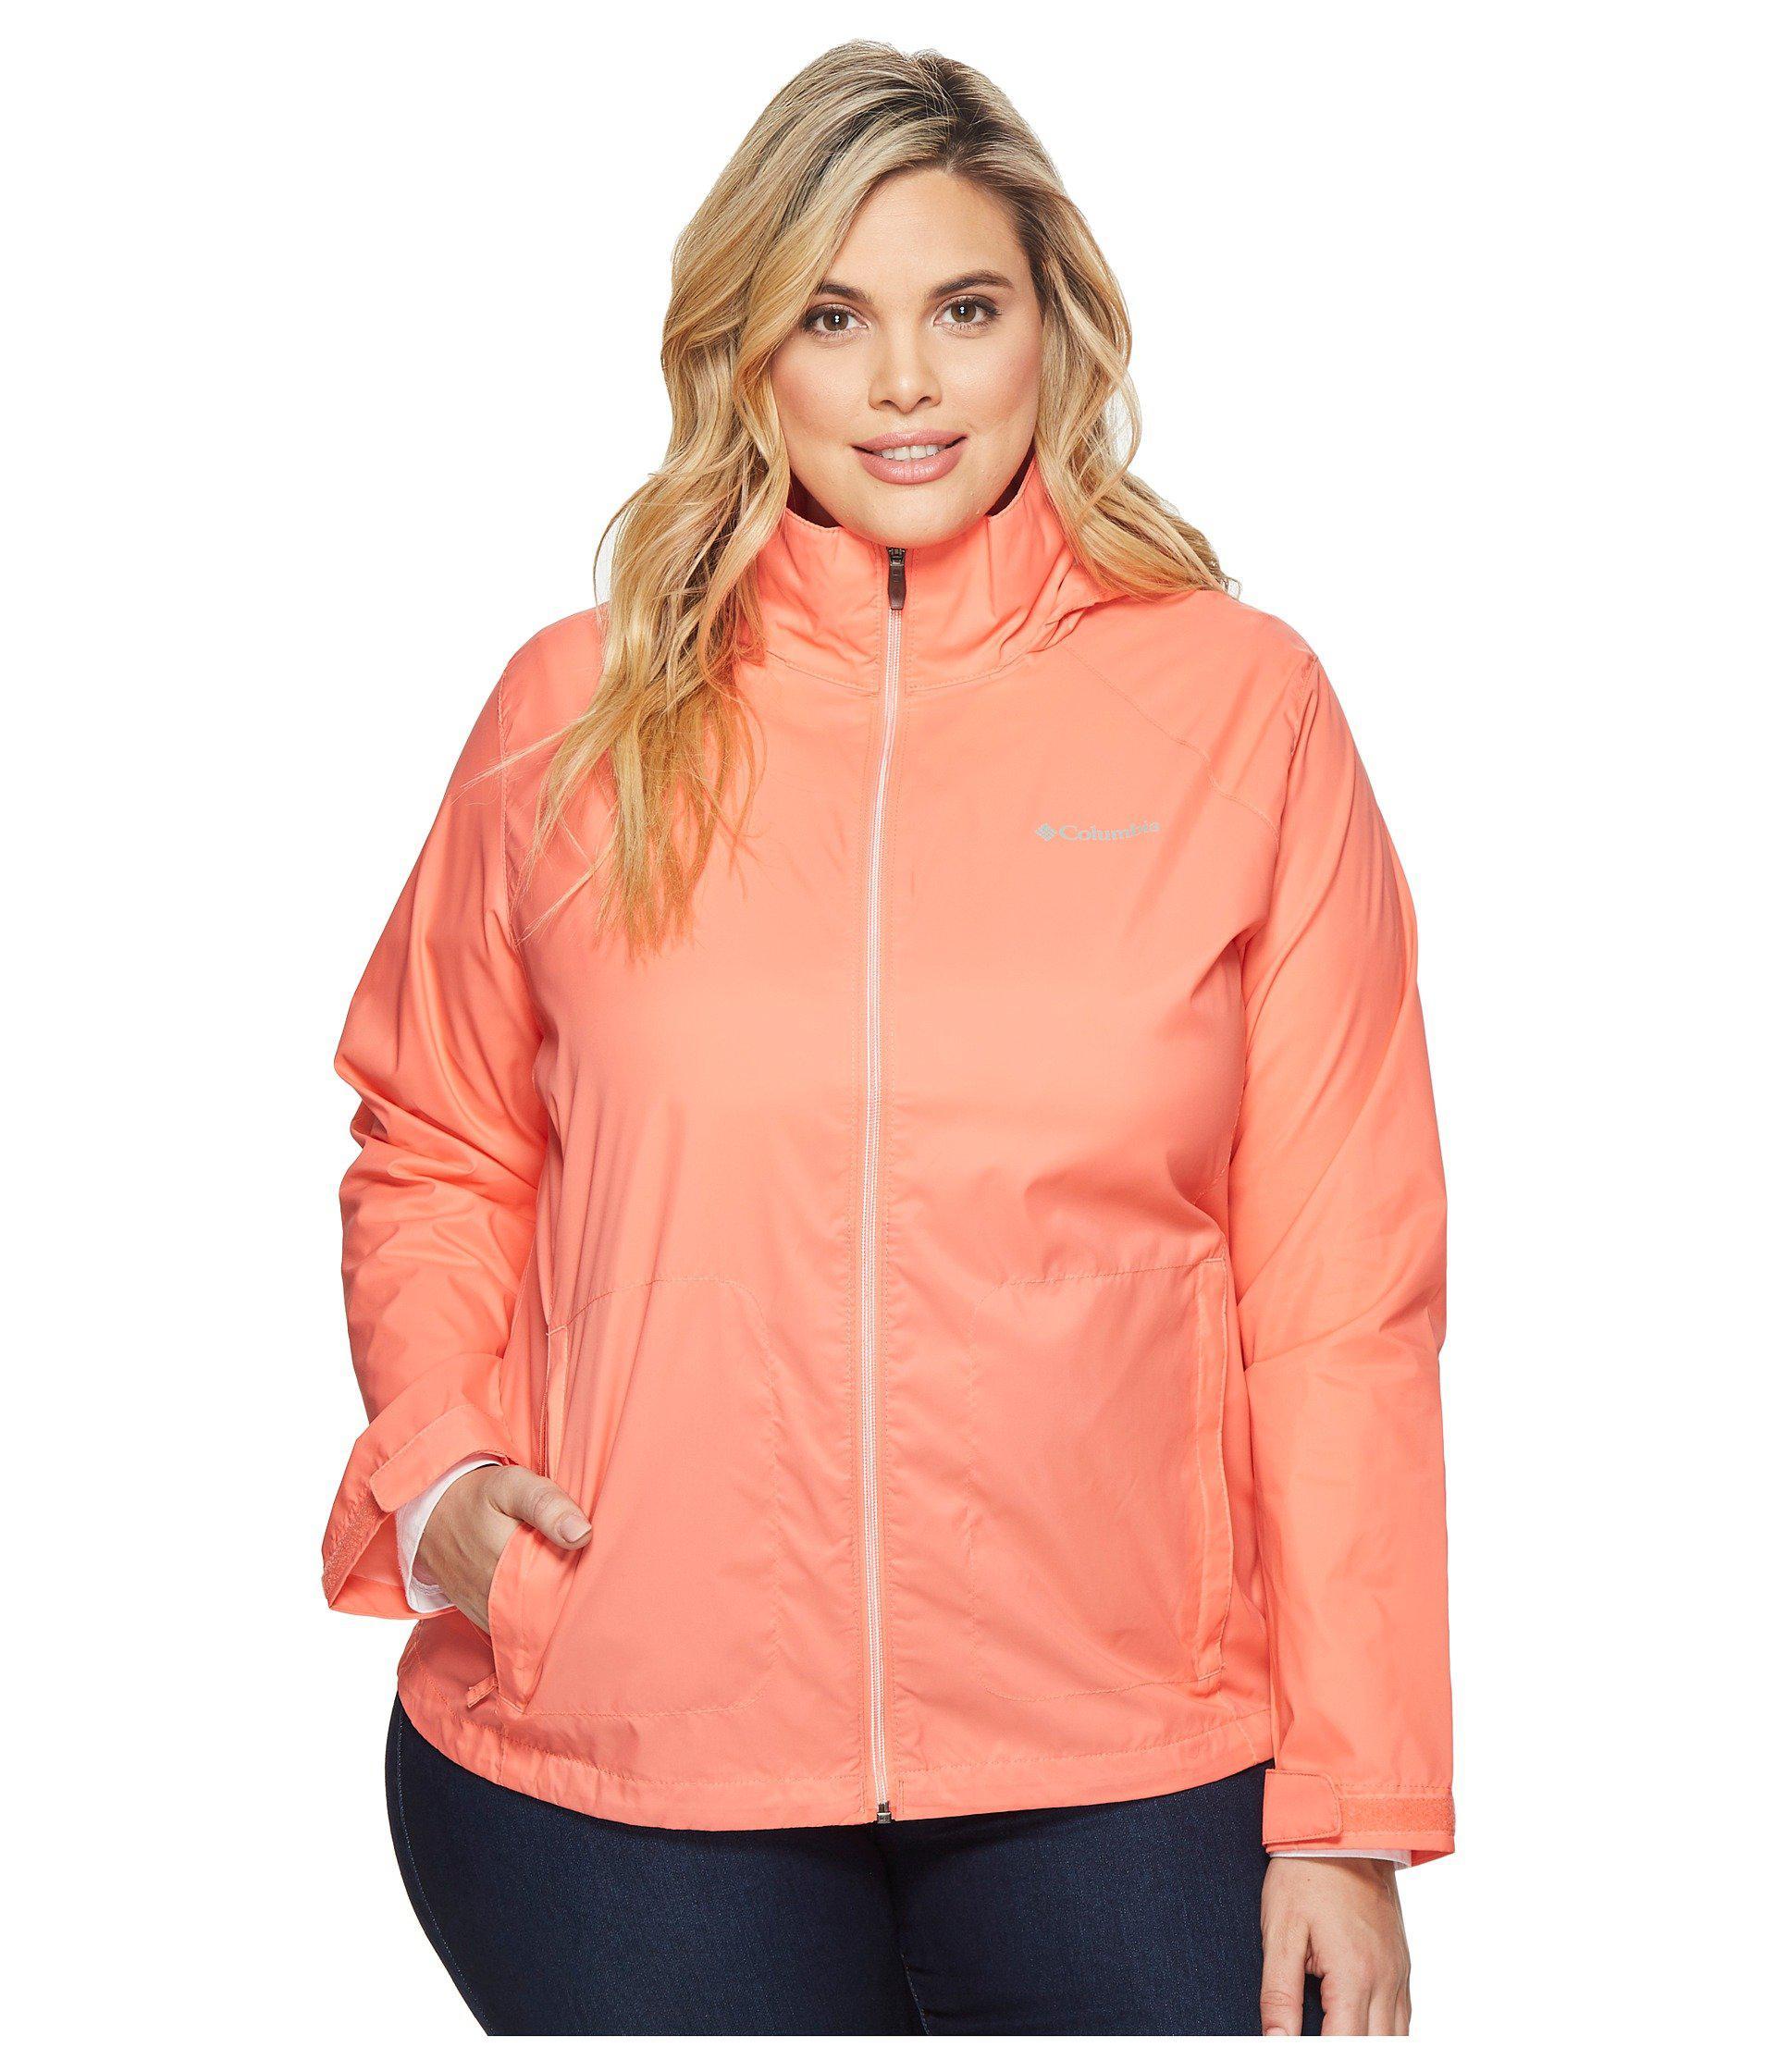 86ee7d399cc61 Columbia. Women s Plus Size Switchbacktm Ii Jacket